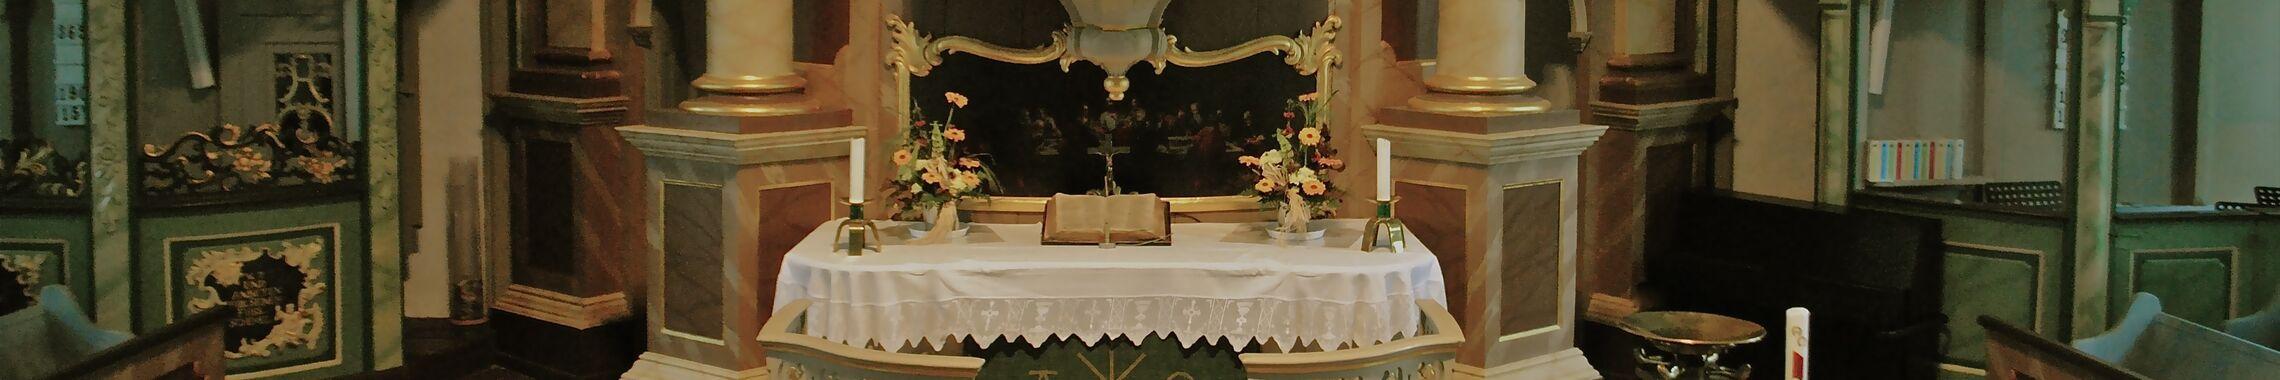 altarheaderblur